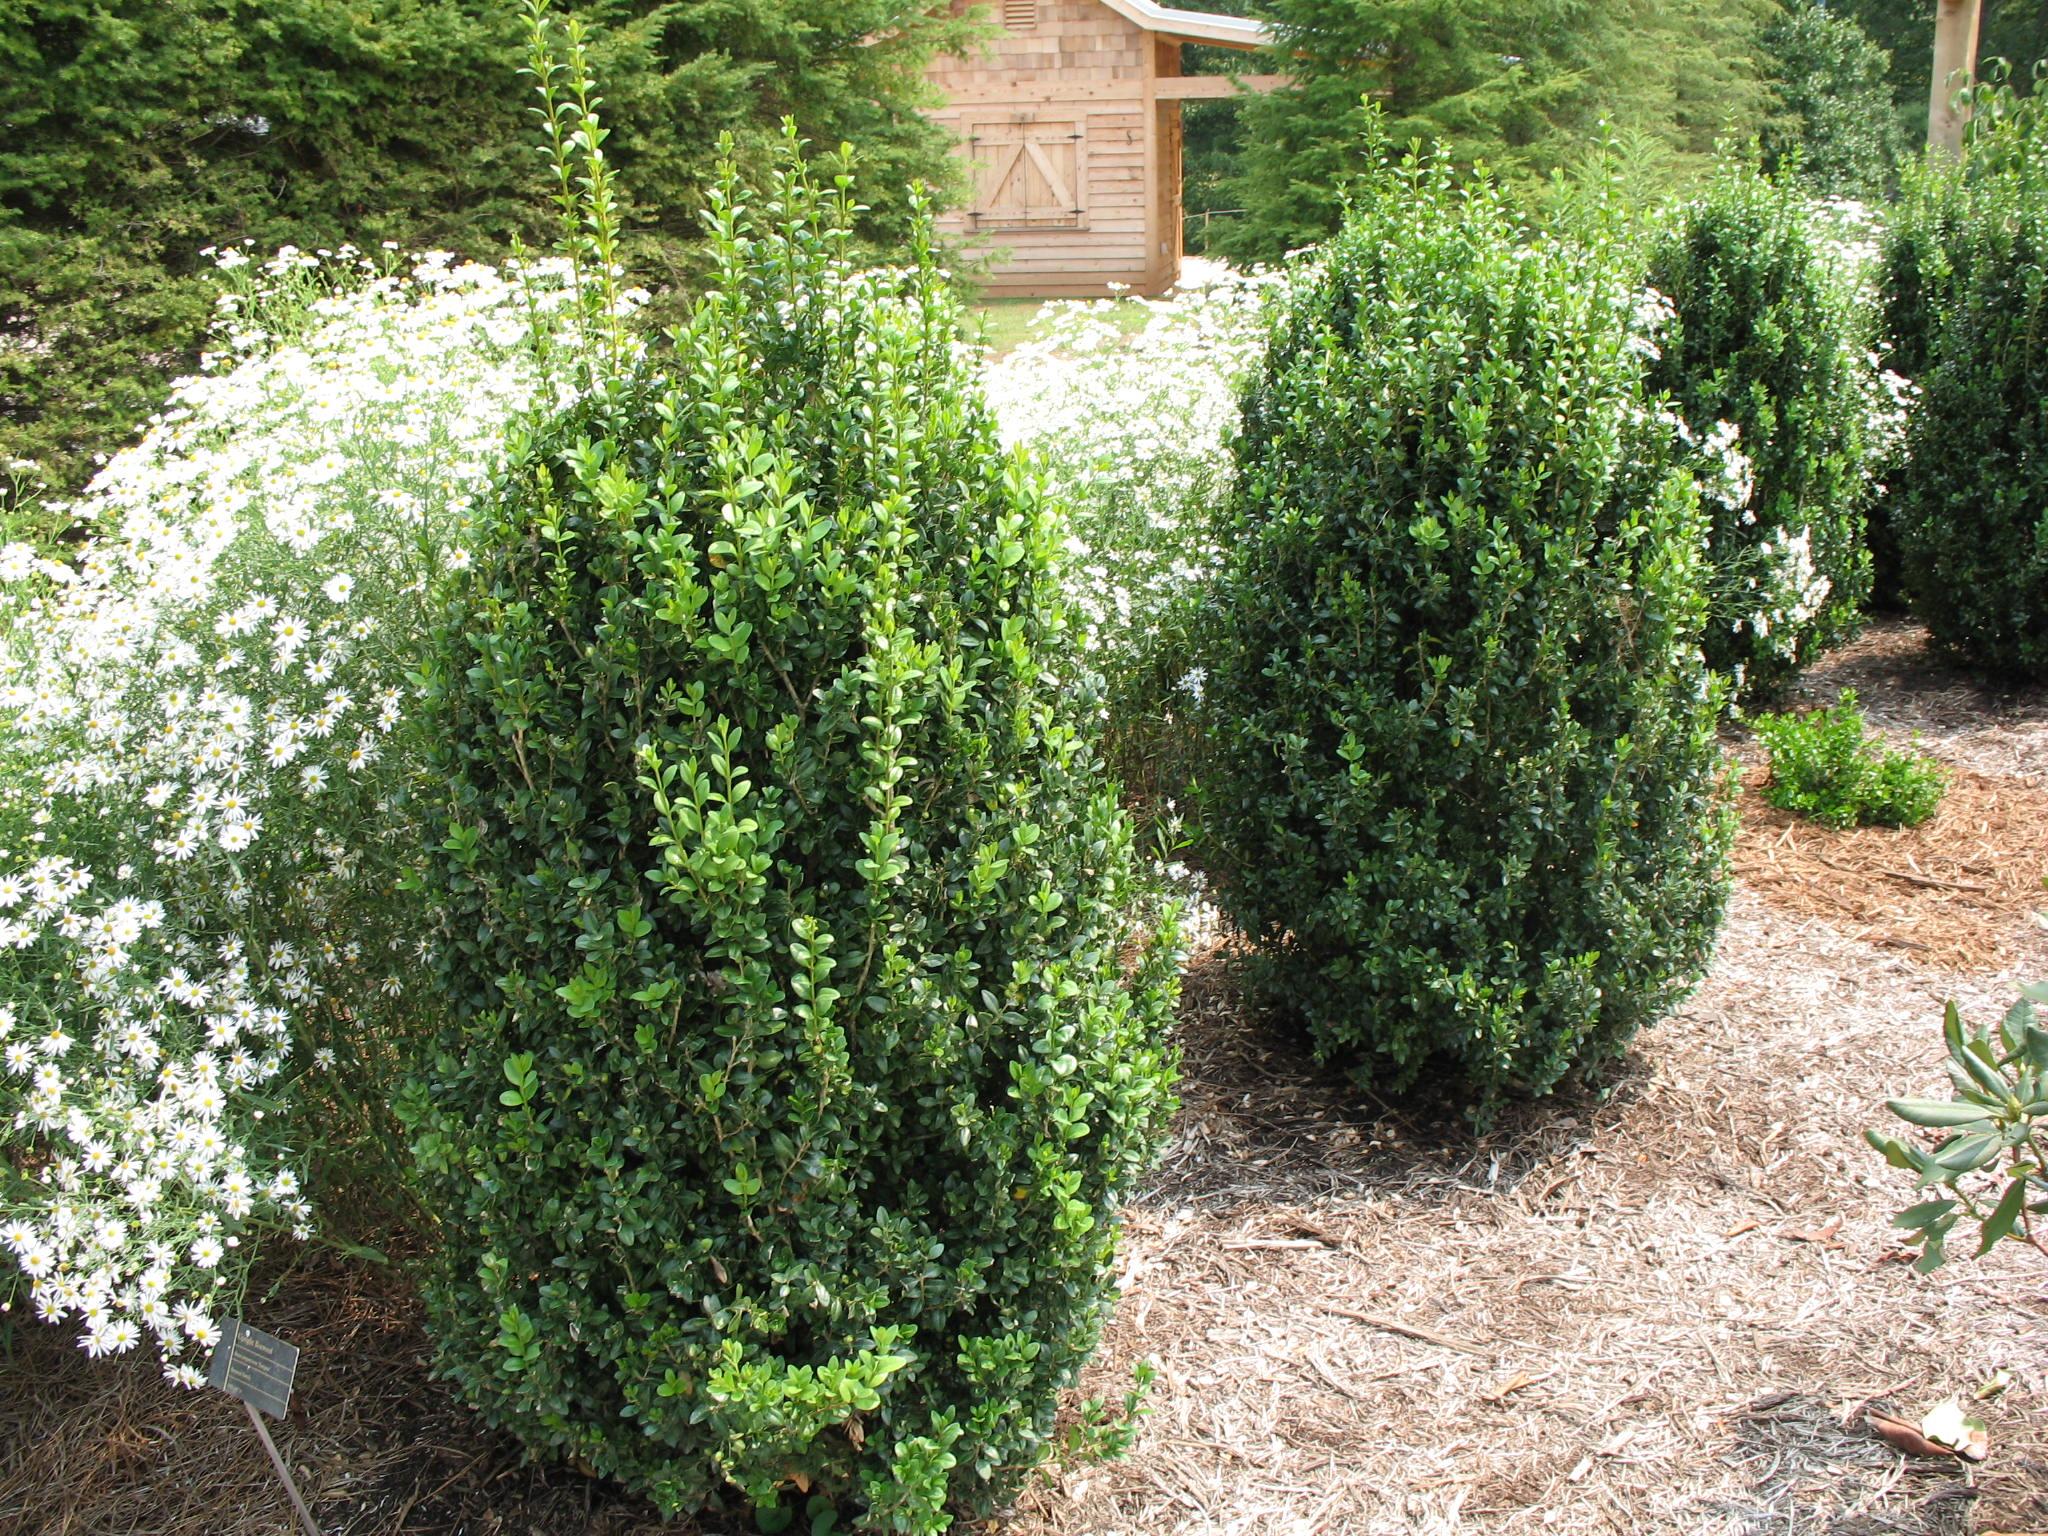 Buxus sempervirens 'Fastigiata'    / Buxus sempervirens 'Fastigiata'